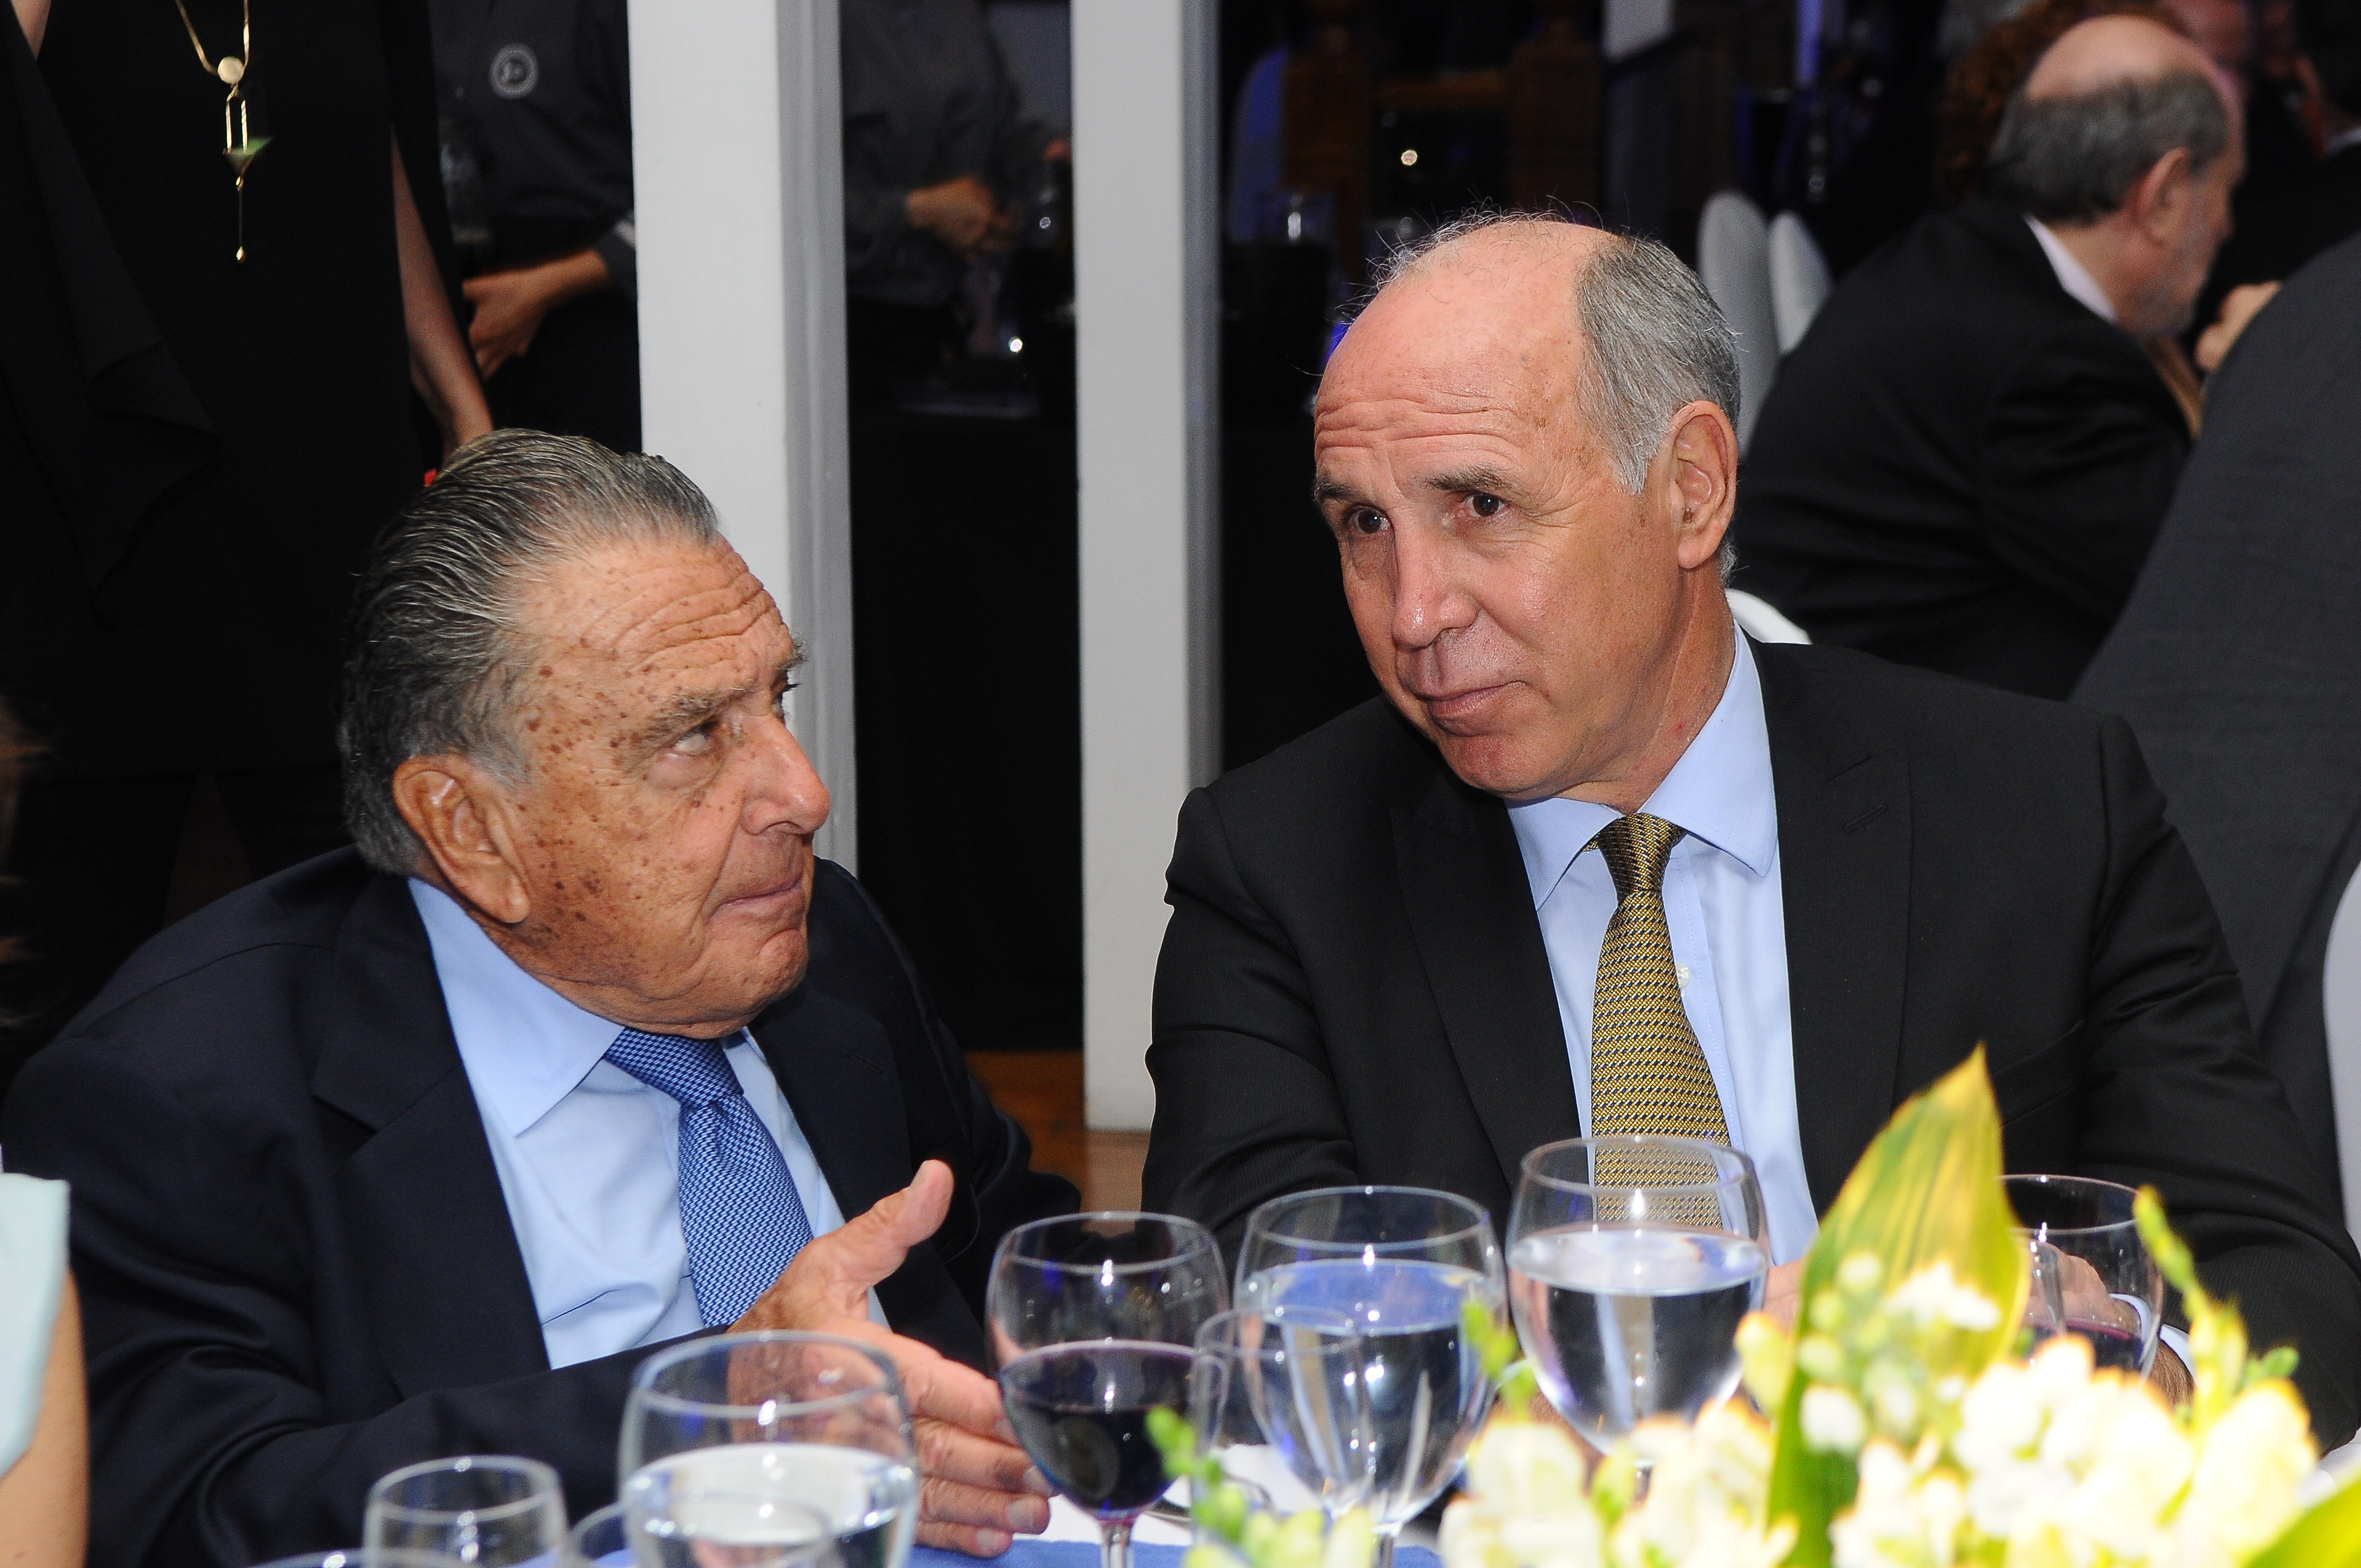 El empresario Eduardo Eurnekian junto al presidente de la Corte Suprema de Justicia de la Nación, Ricardo Lorenzetti